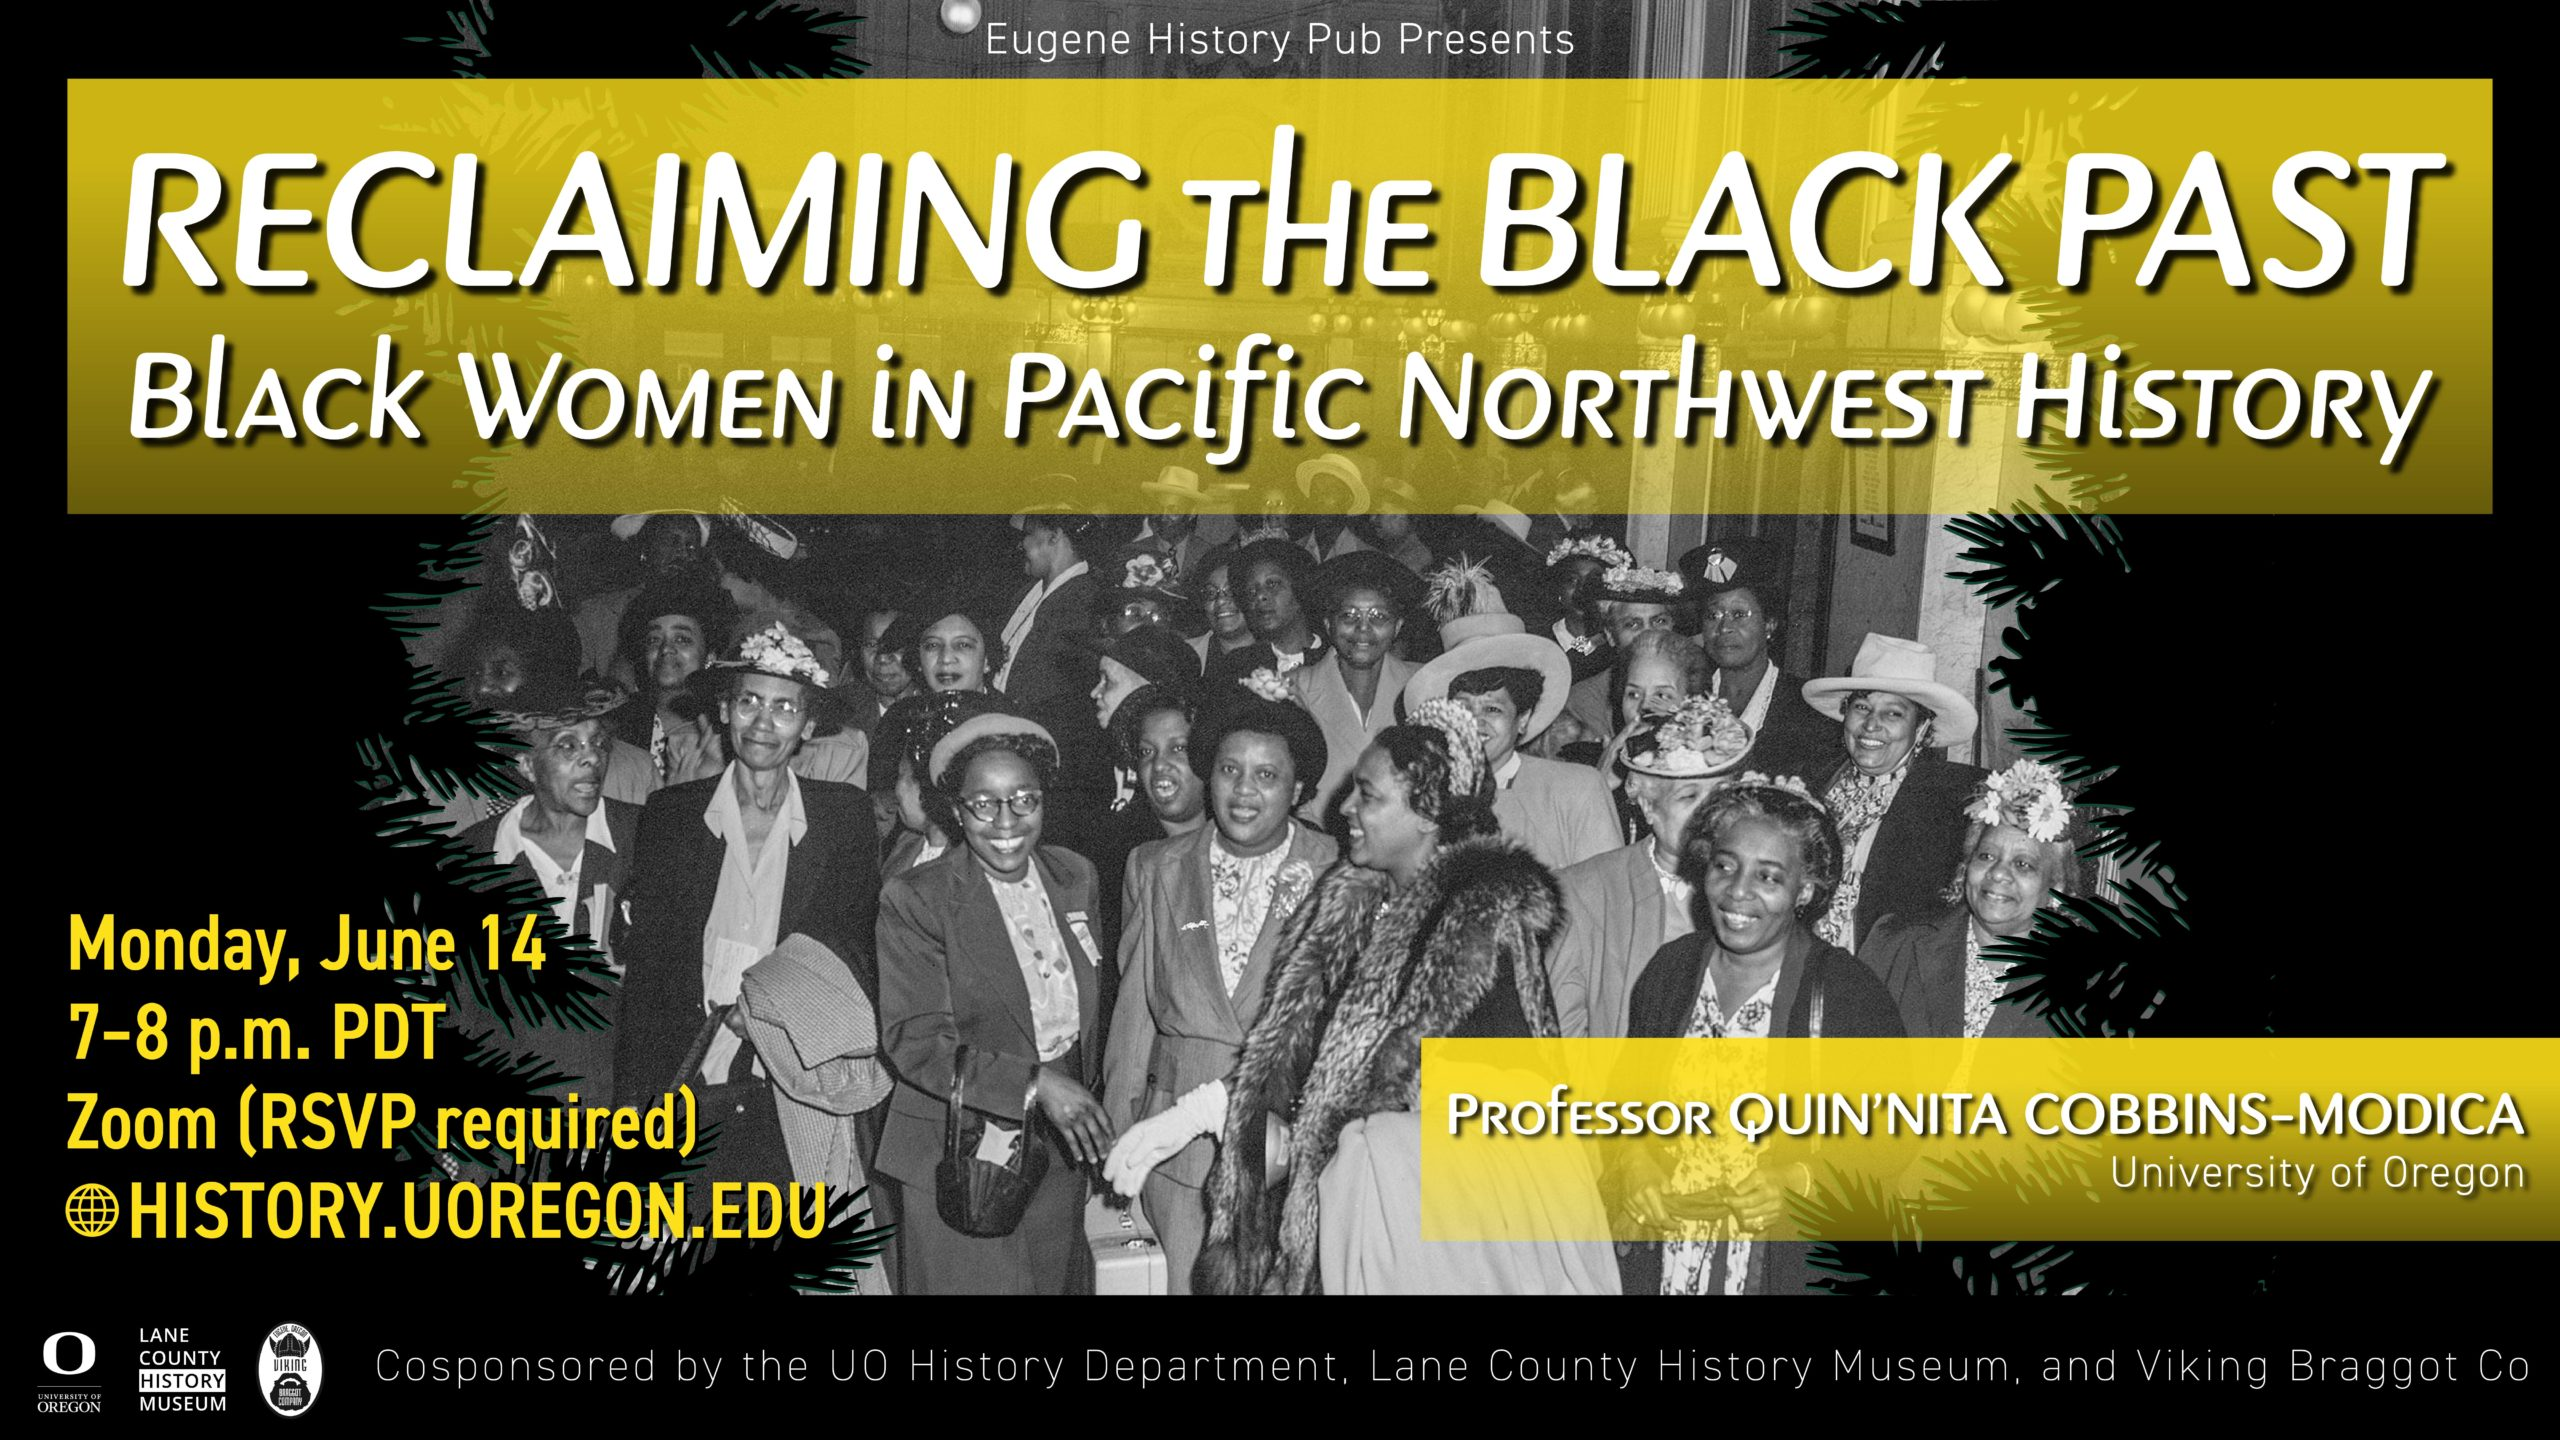 Reclaiming the black past. History pub poster, June 14